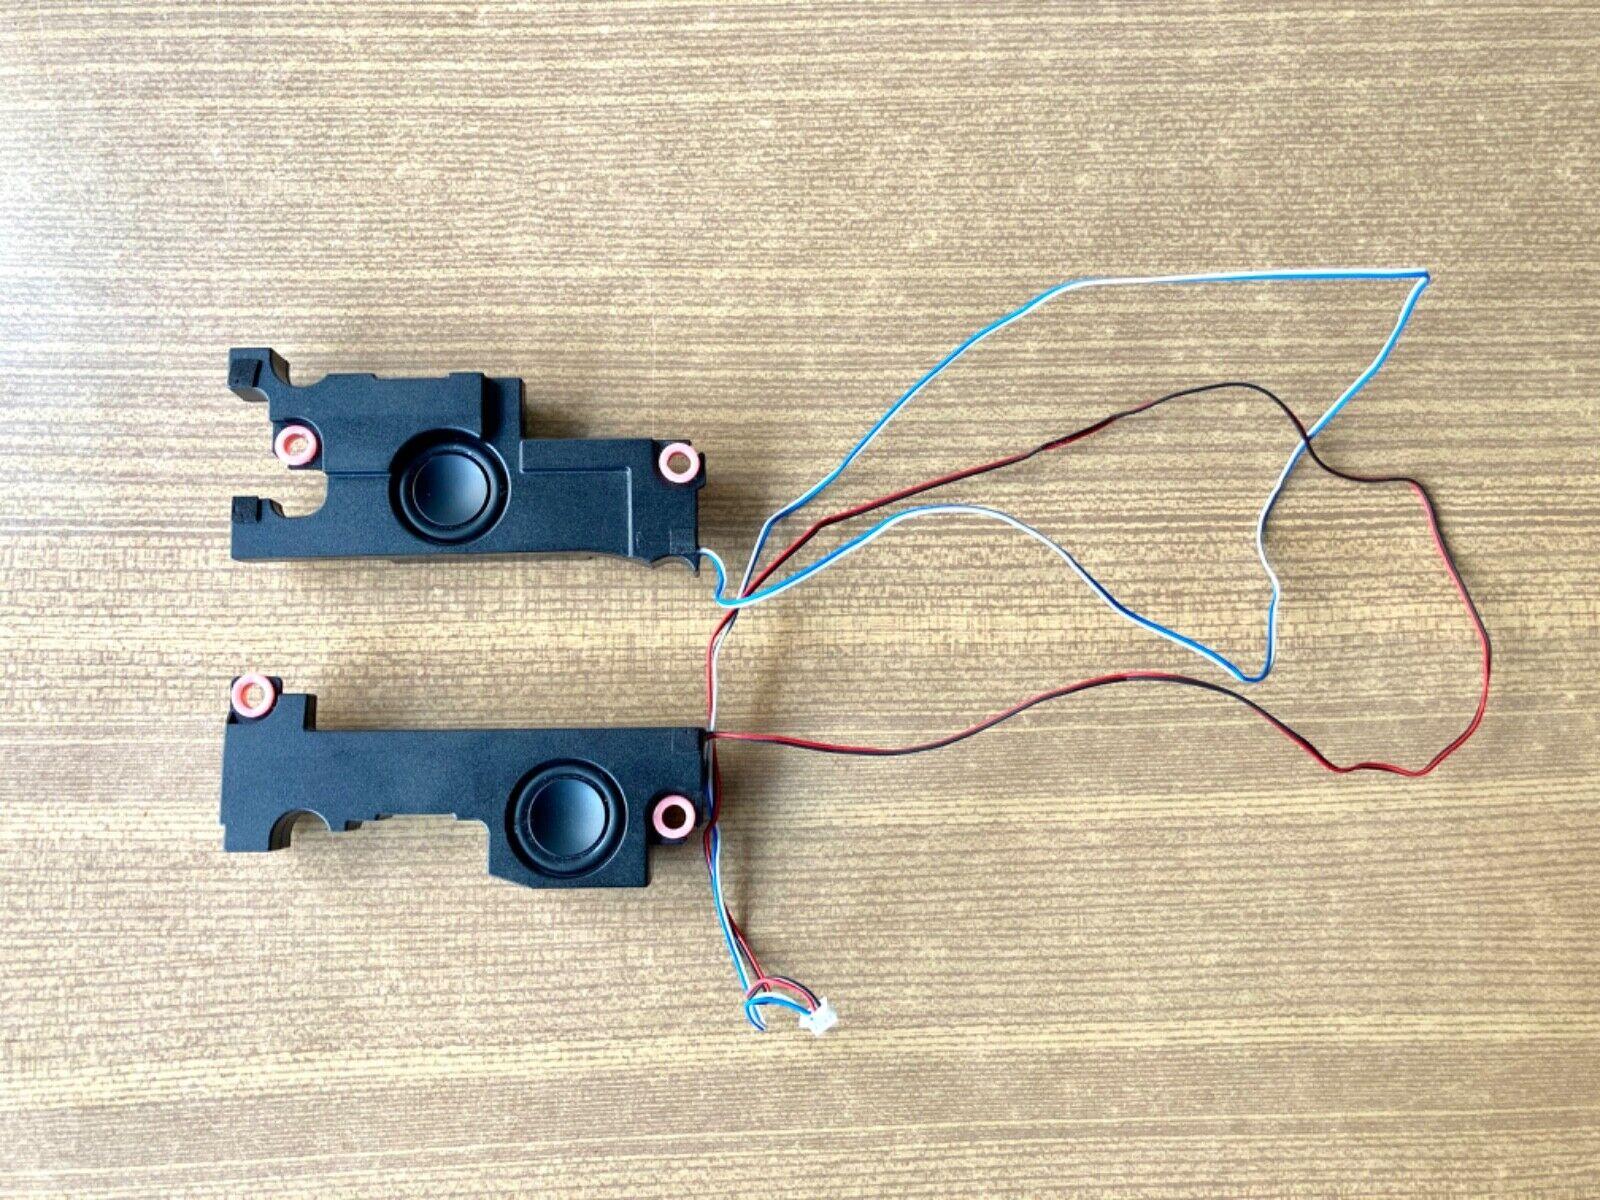 Enceintes hauts parleurs origine pk23000i300 pour asus r900v etc..